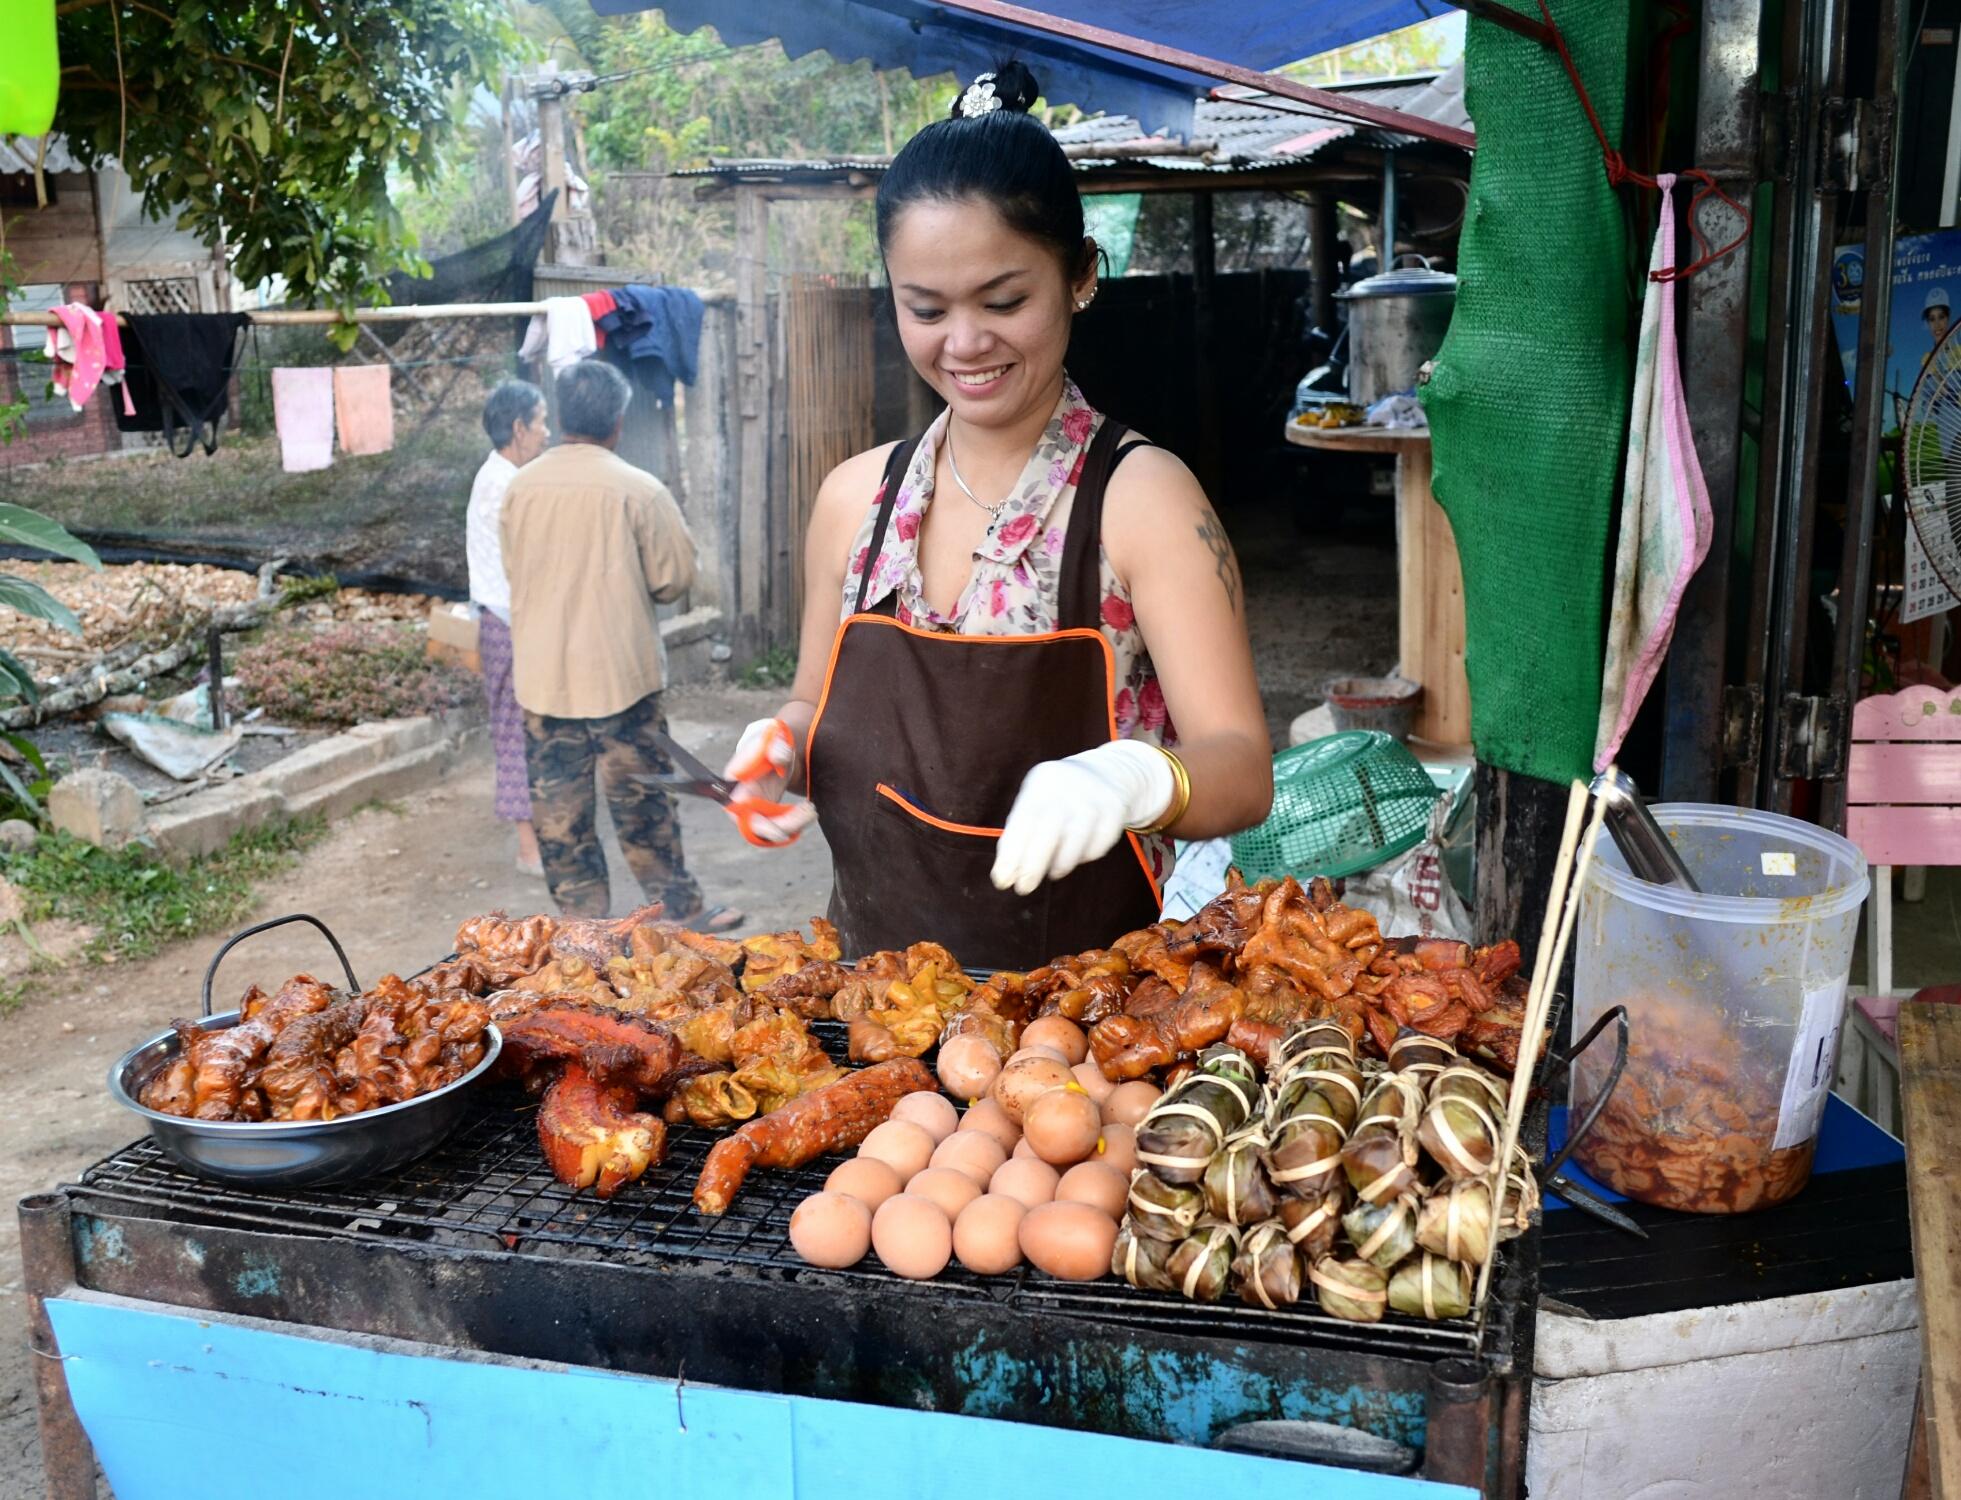 Things To Do In Bangkok-Thailand While Volunteering